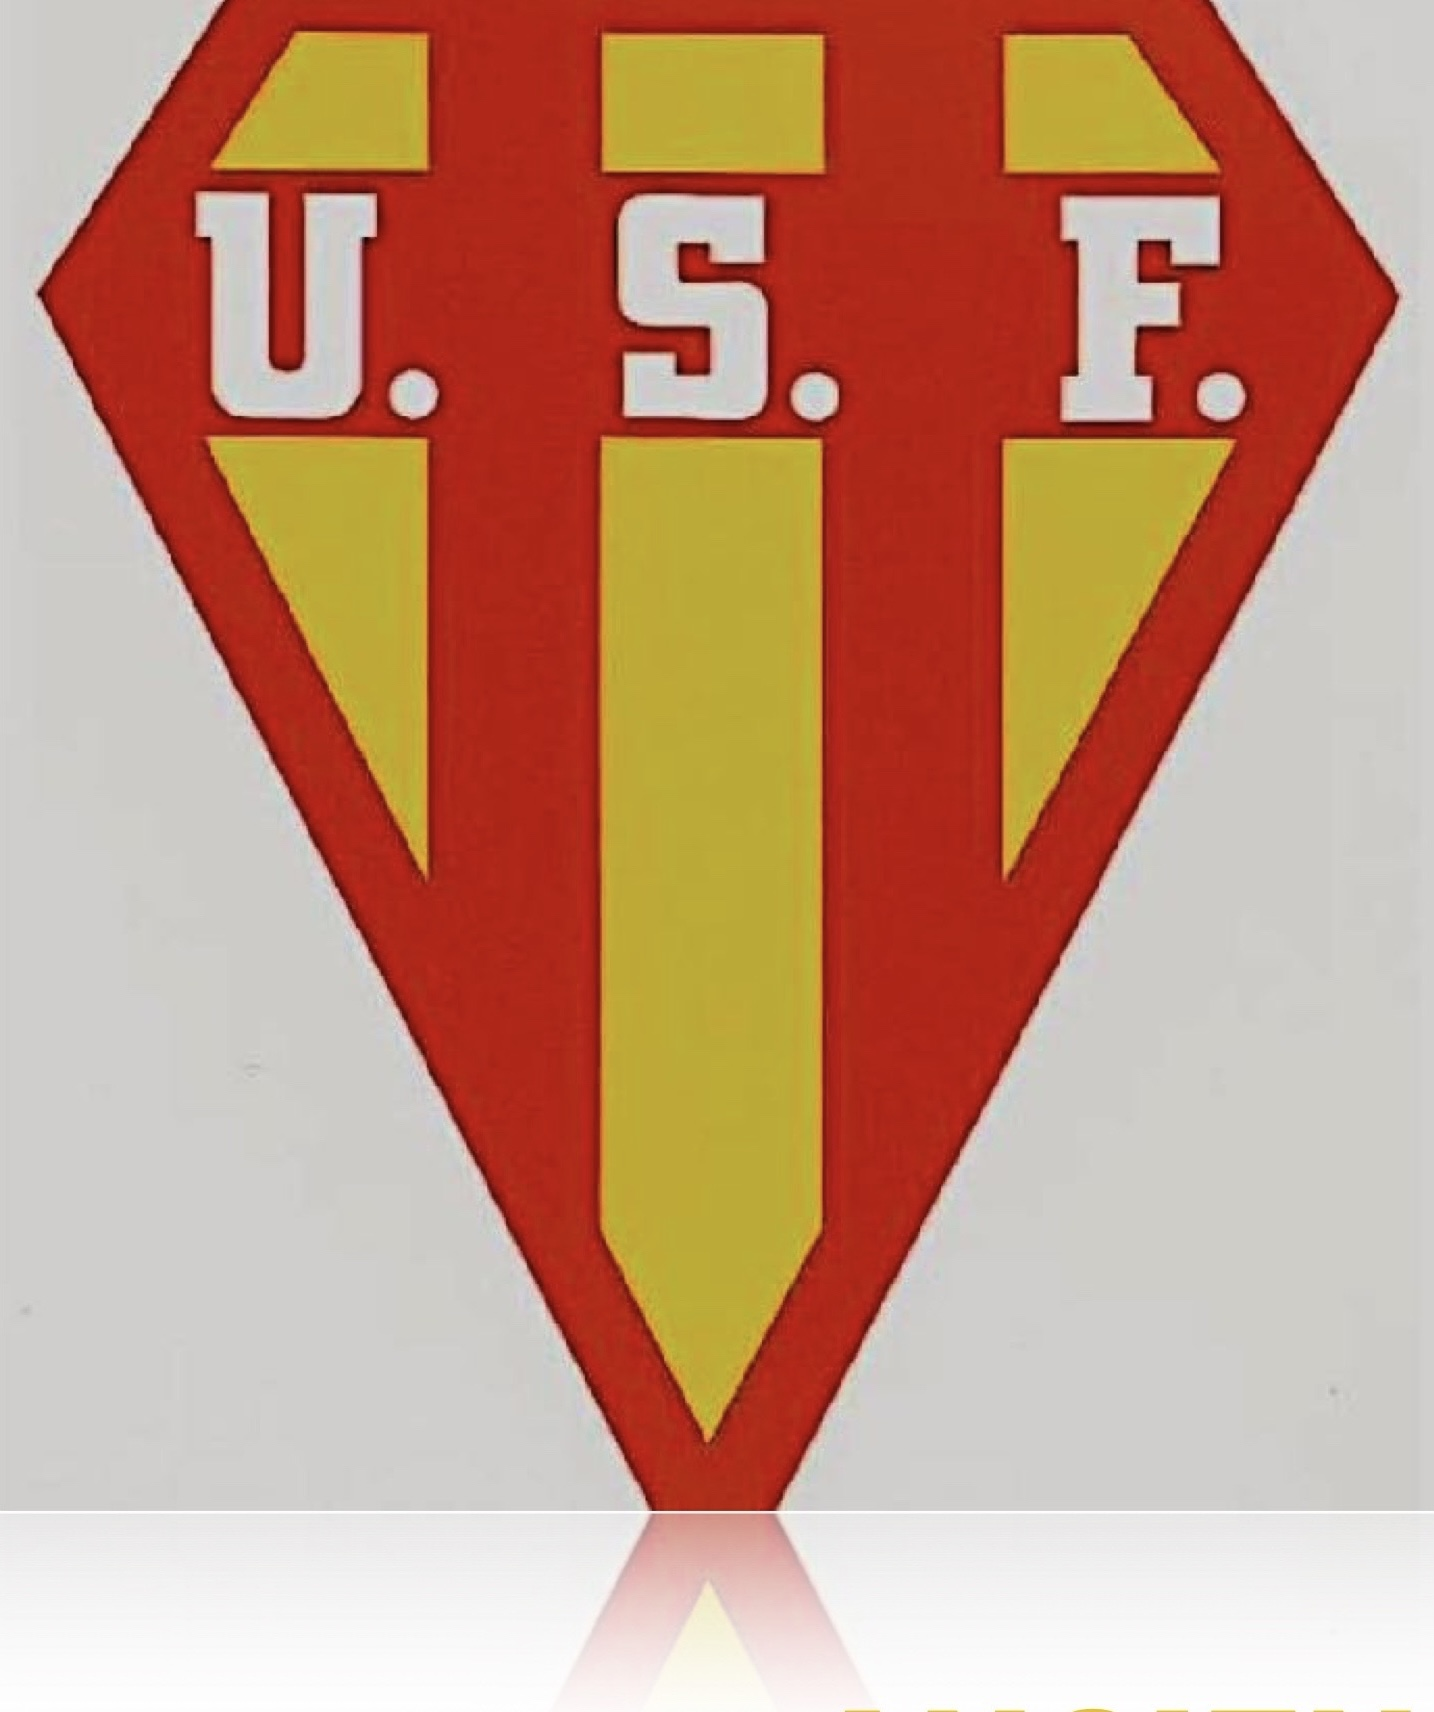 Recherche anciens joueurs Union Sportive Finhanaise